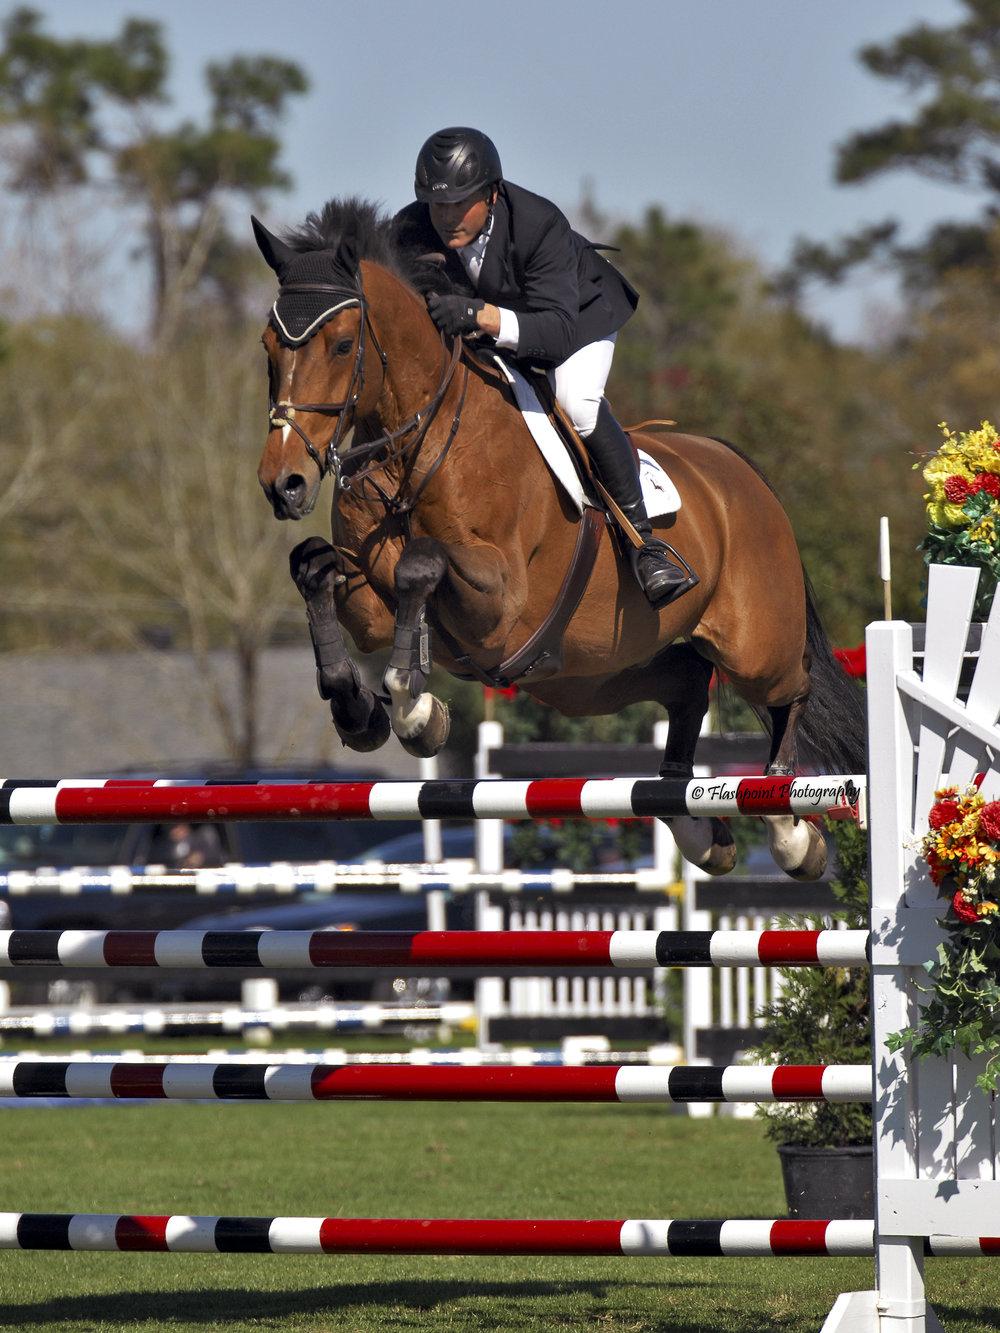 Bob and Dana Brawley - Brawley Farms Inc: 2012 USEF National Horse of the Year, 3'6